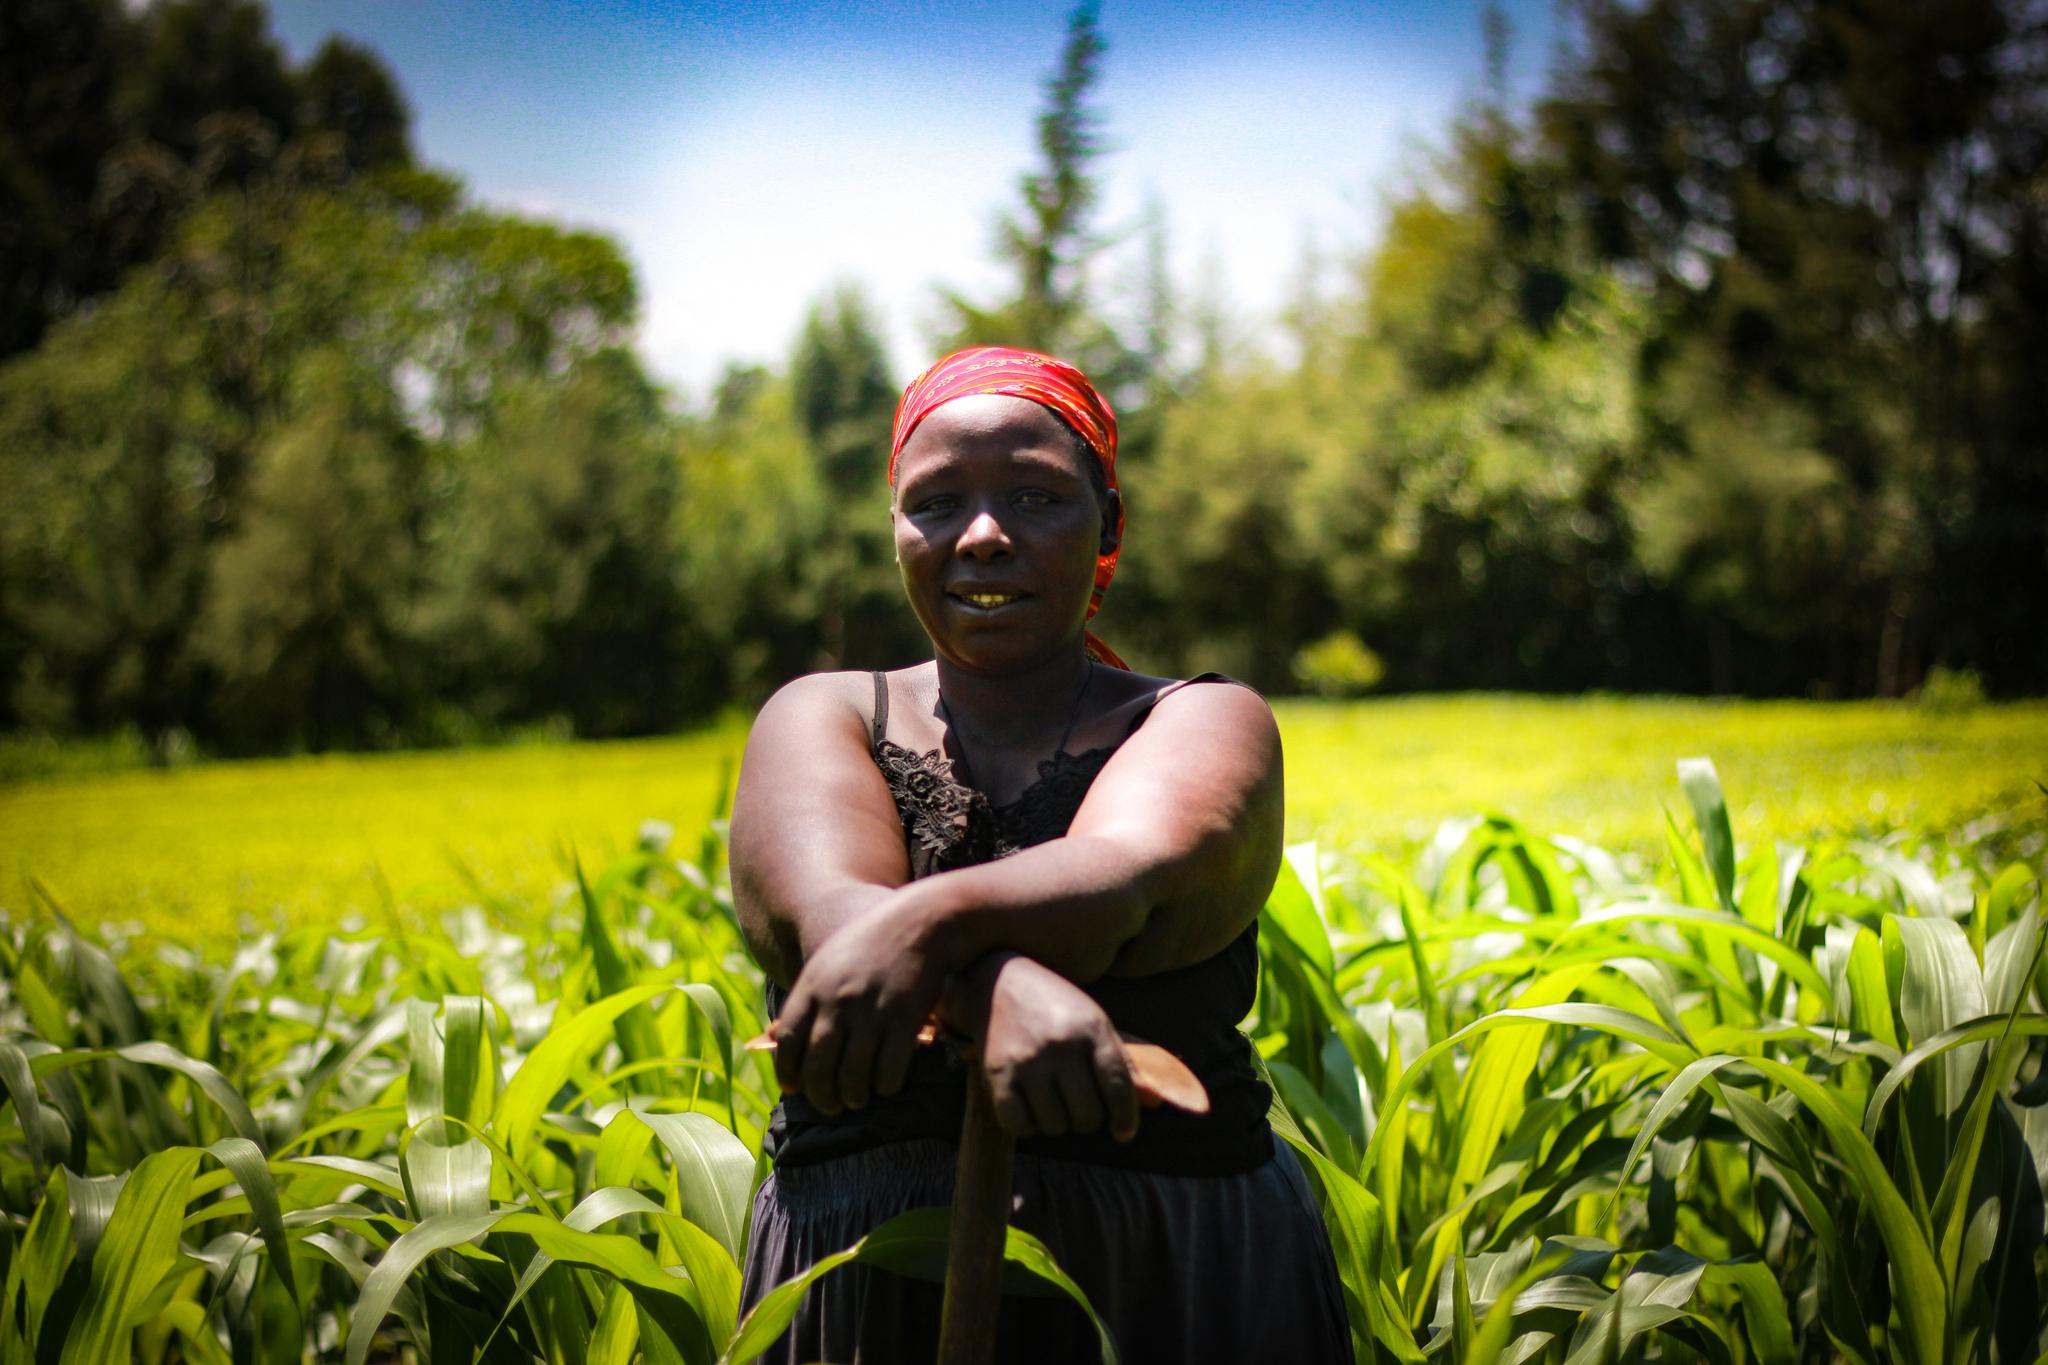 women's land tenure security